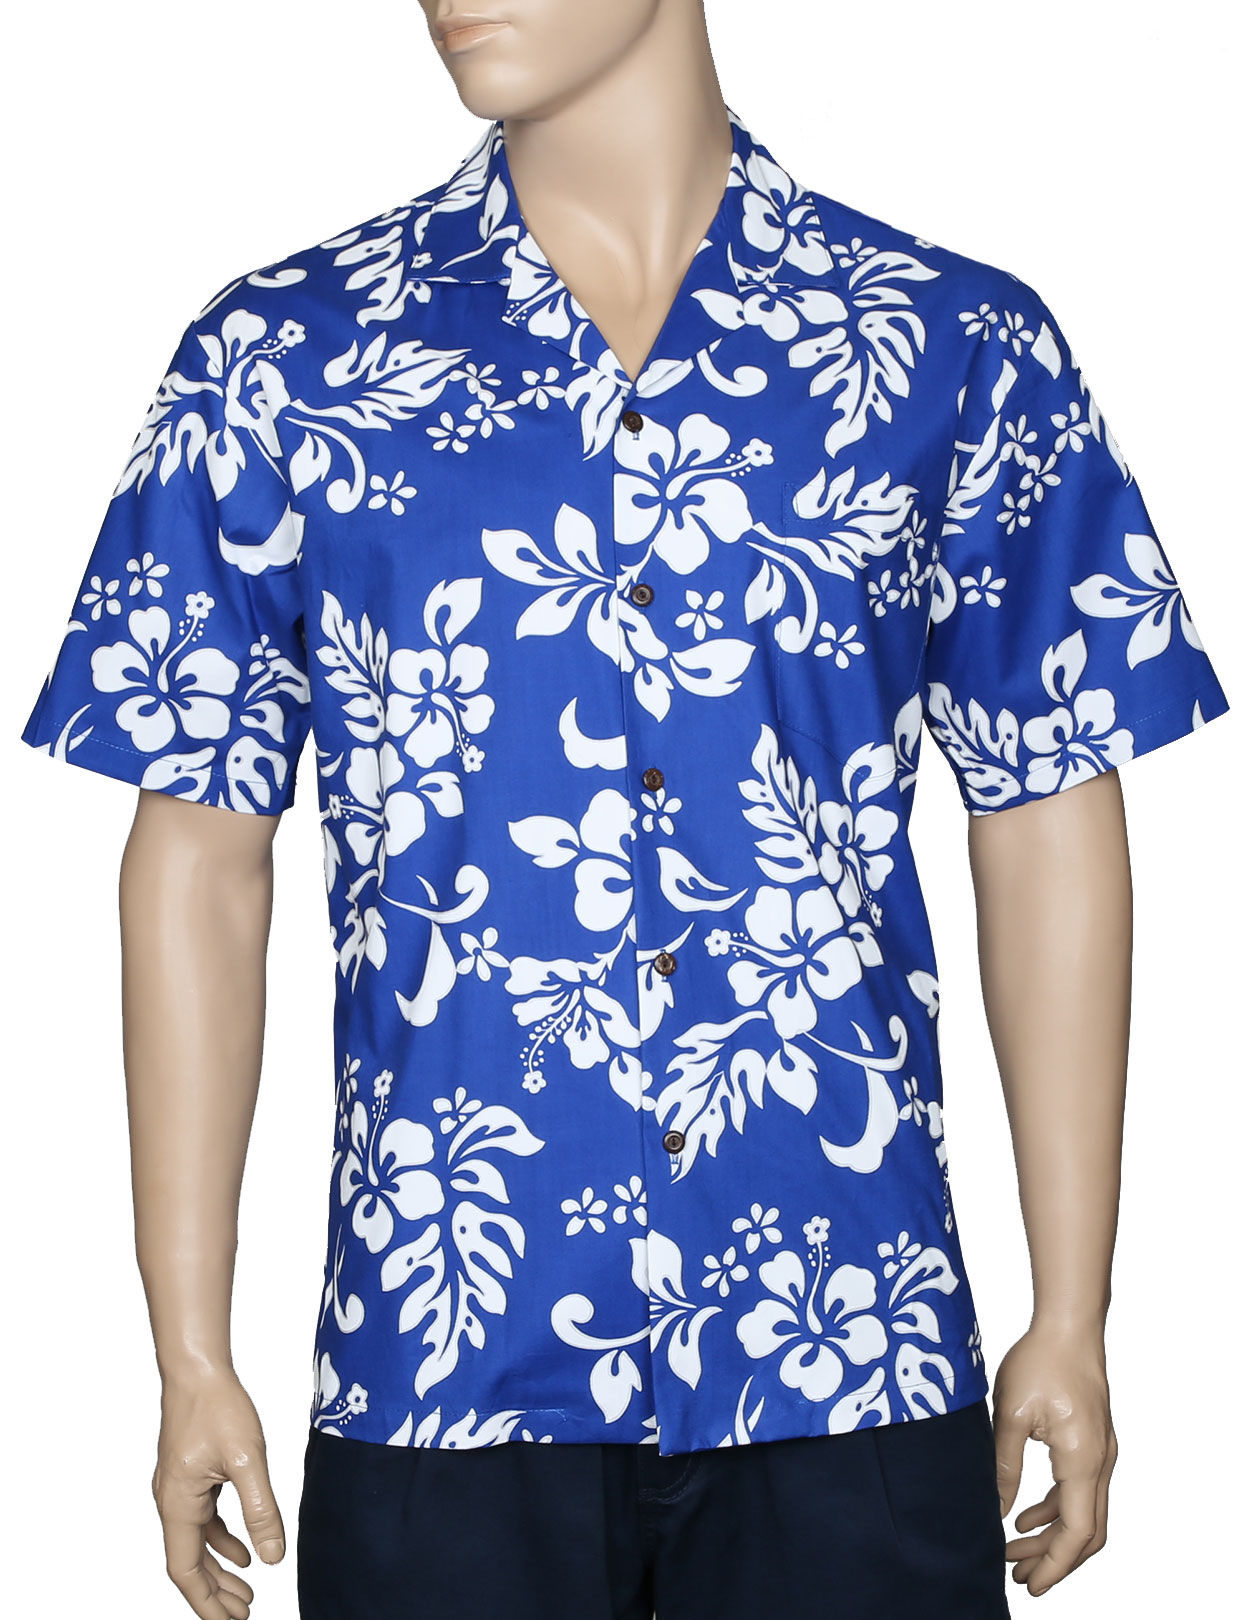 0a55bb1095 Where Do You Buy Hawaiian Shirts